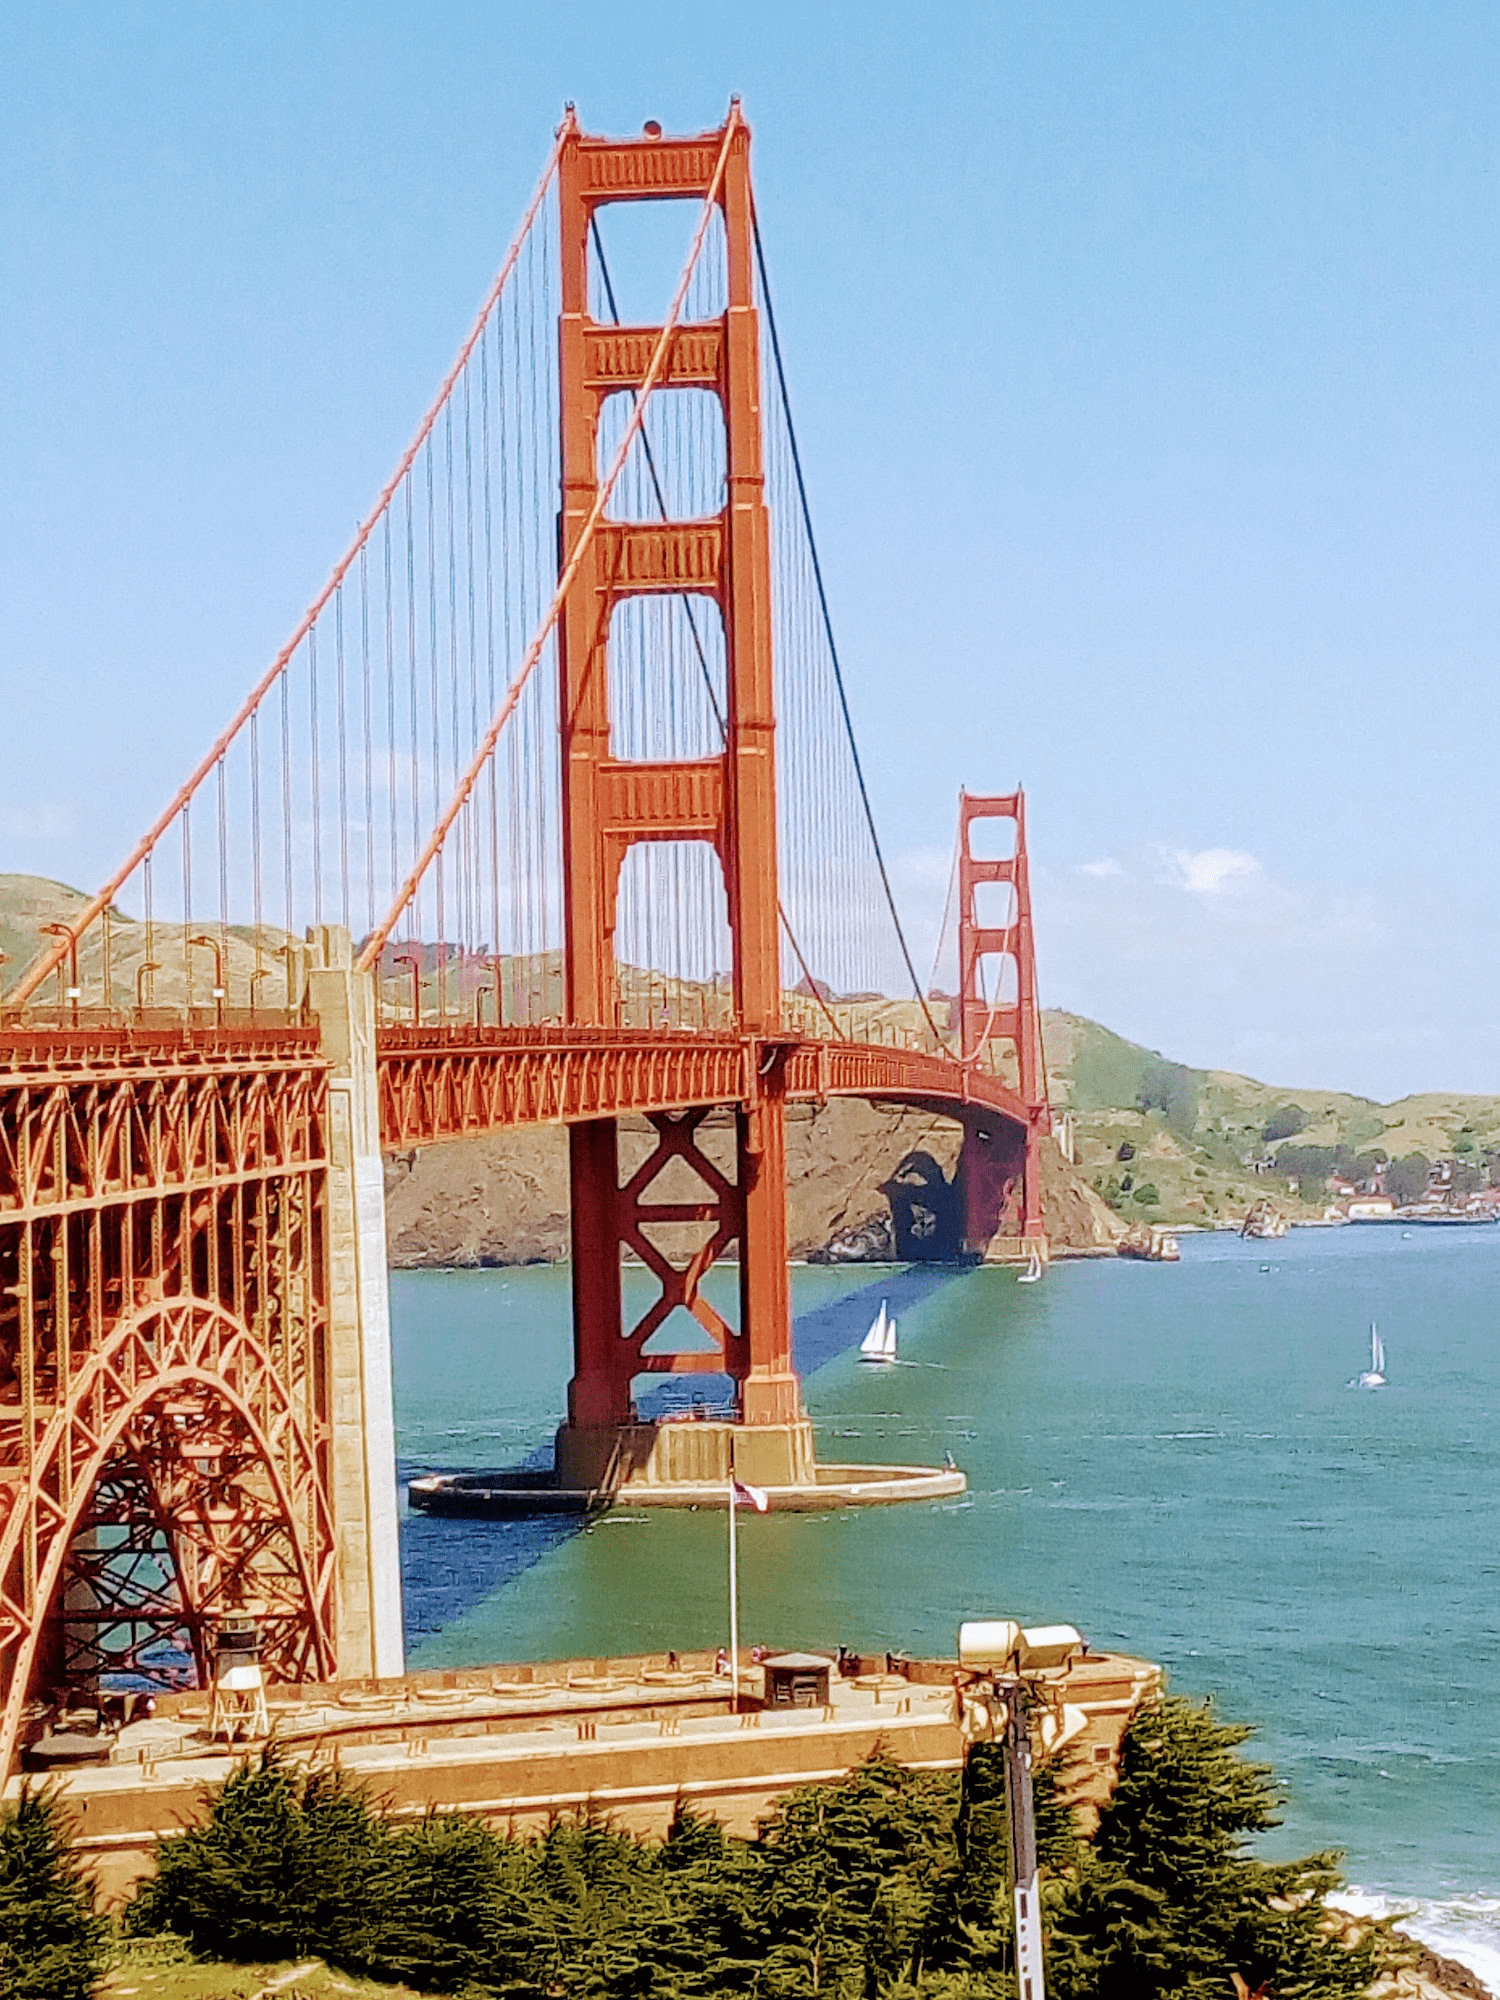 The Golden Gate bridge in San Francisco, in bright sunlight